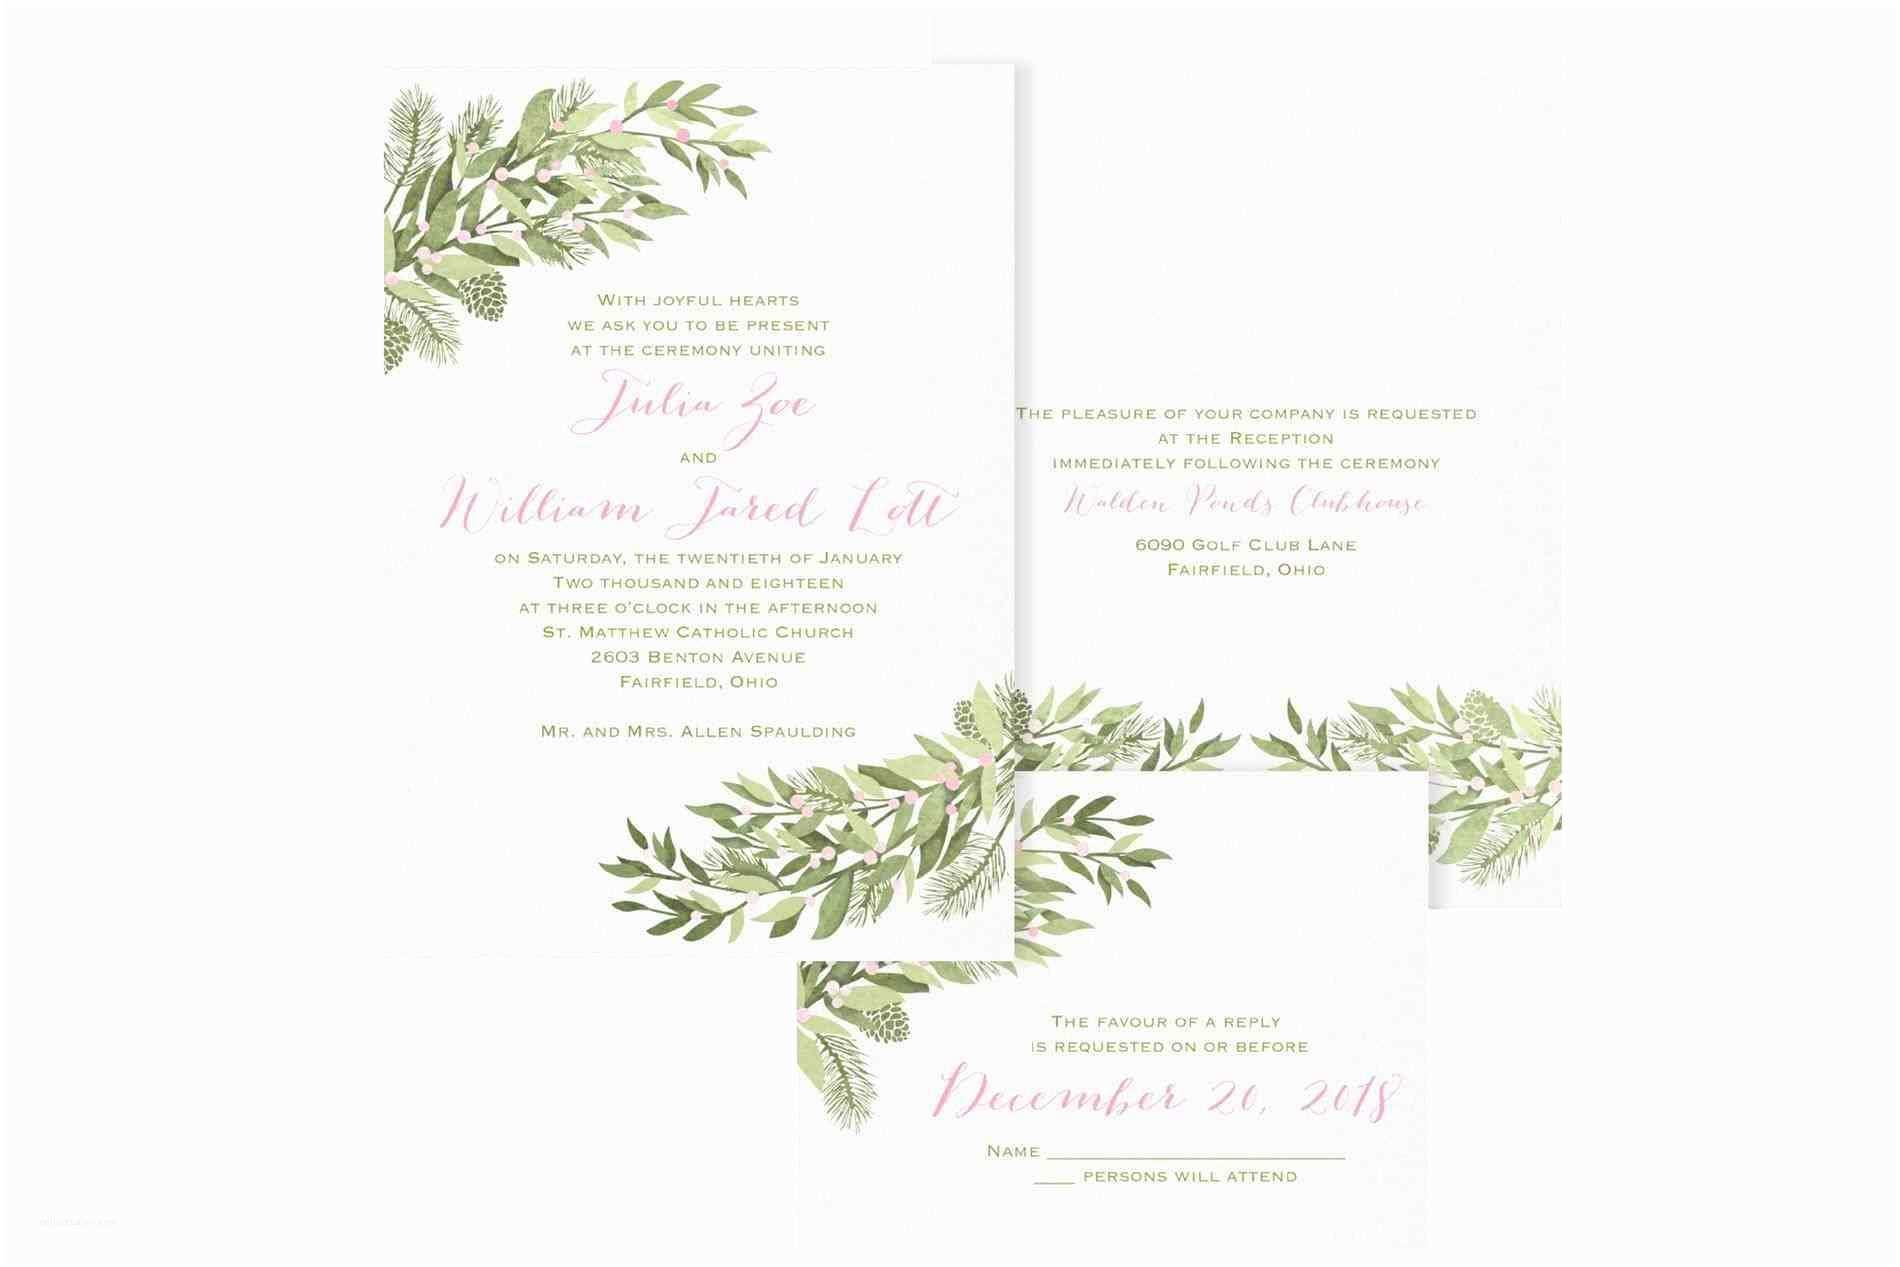 Rustic Winter Wedding Invitations Unique Winter Wedding Invitations